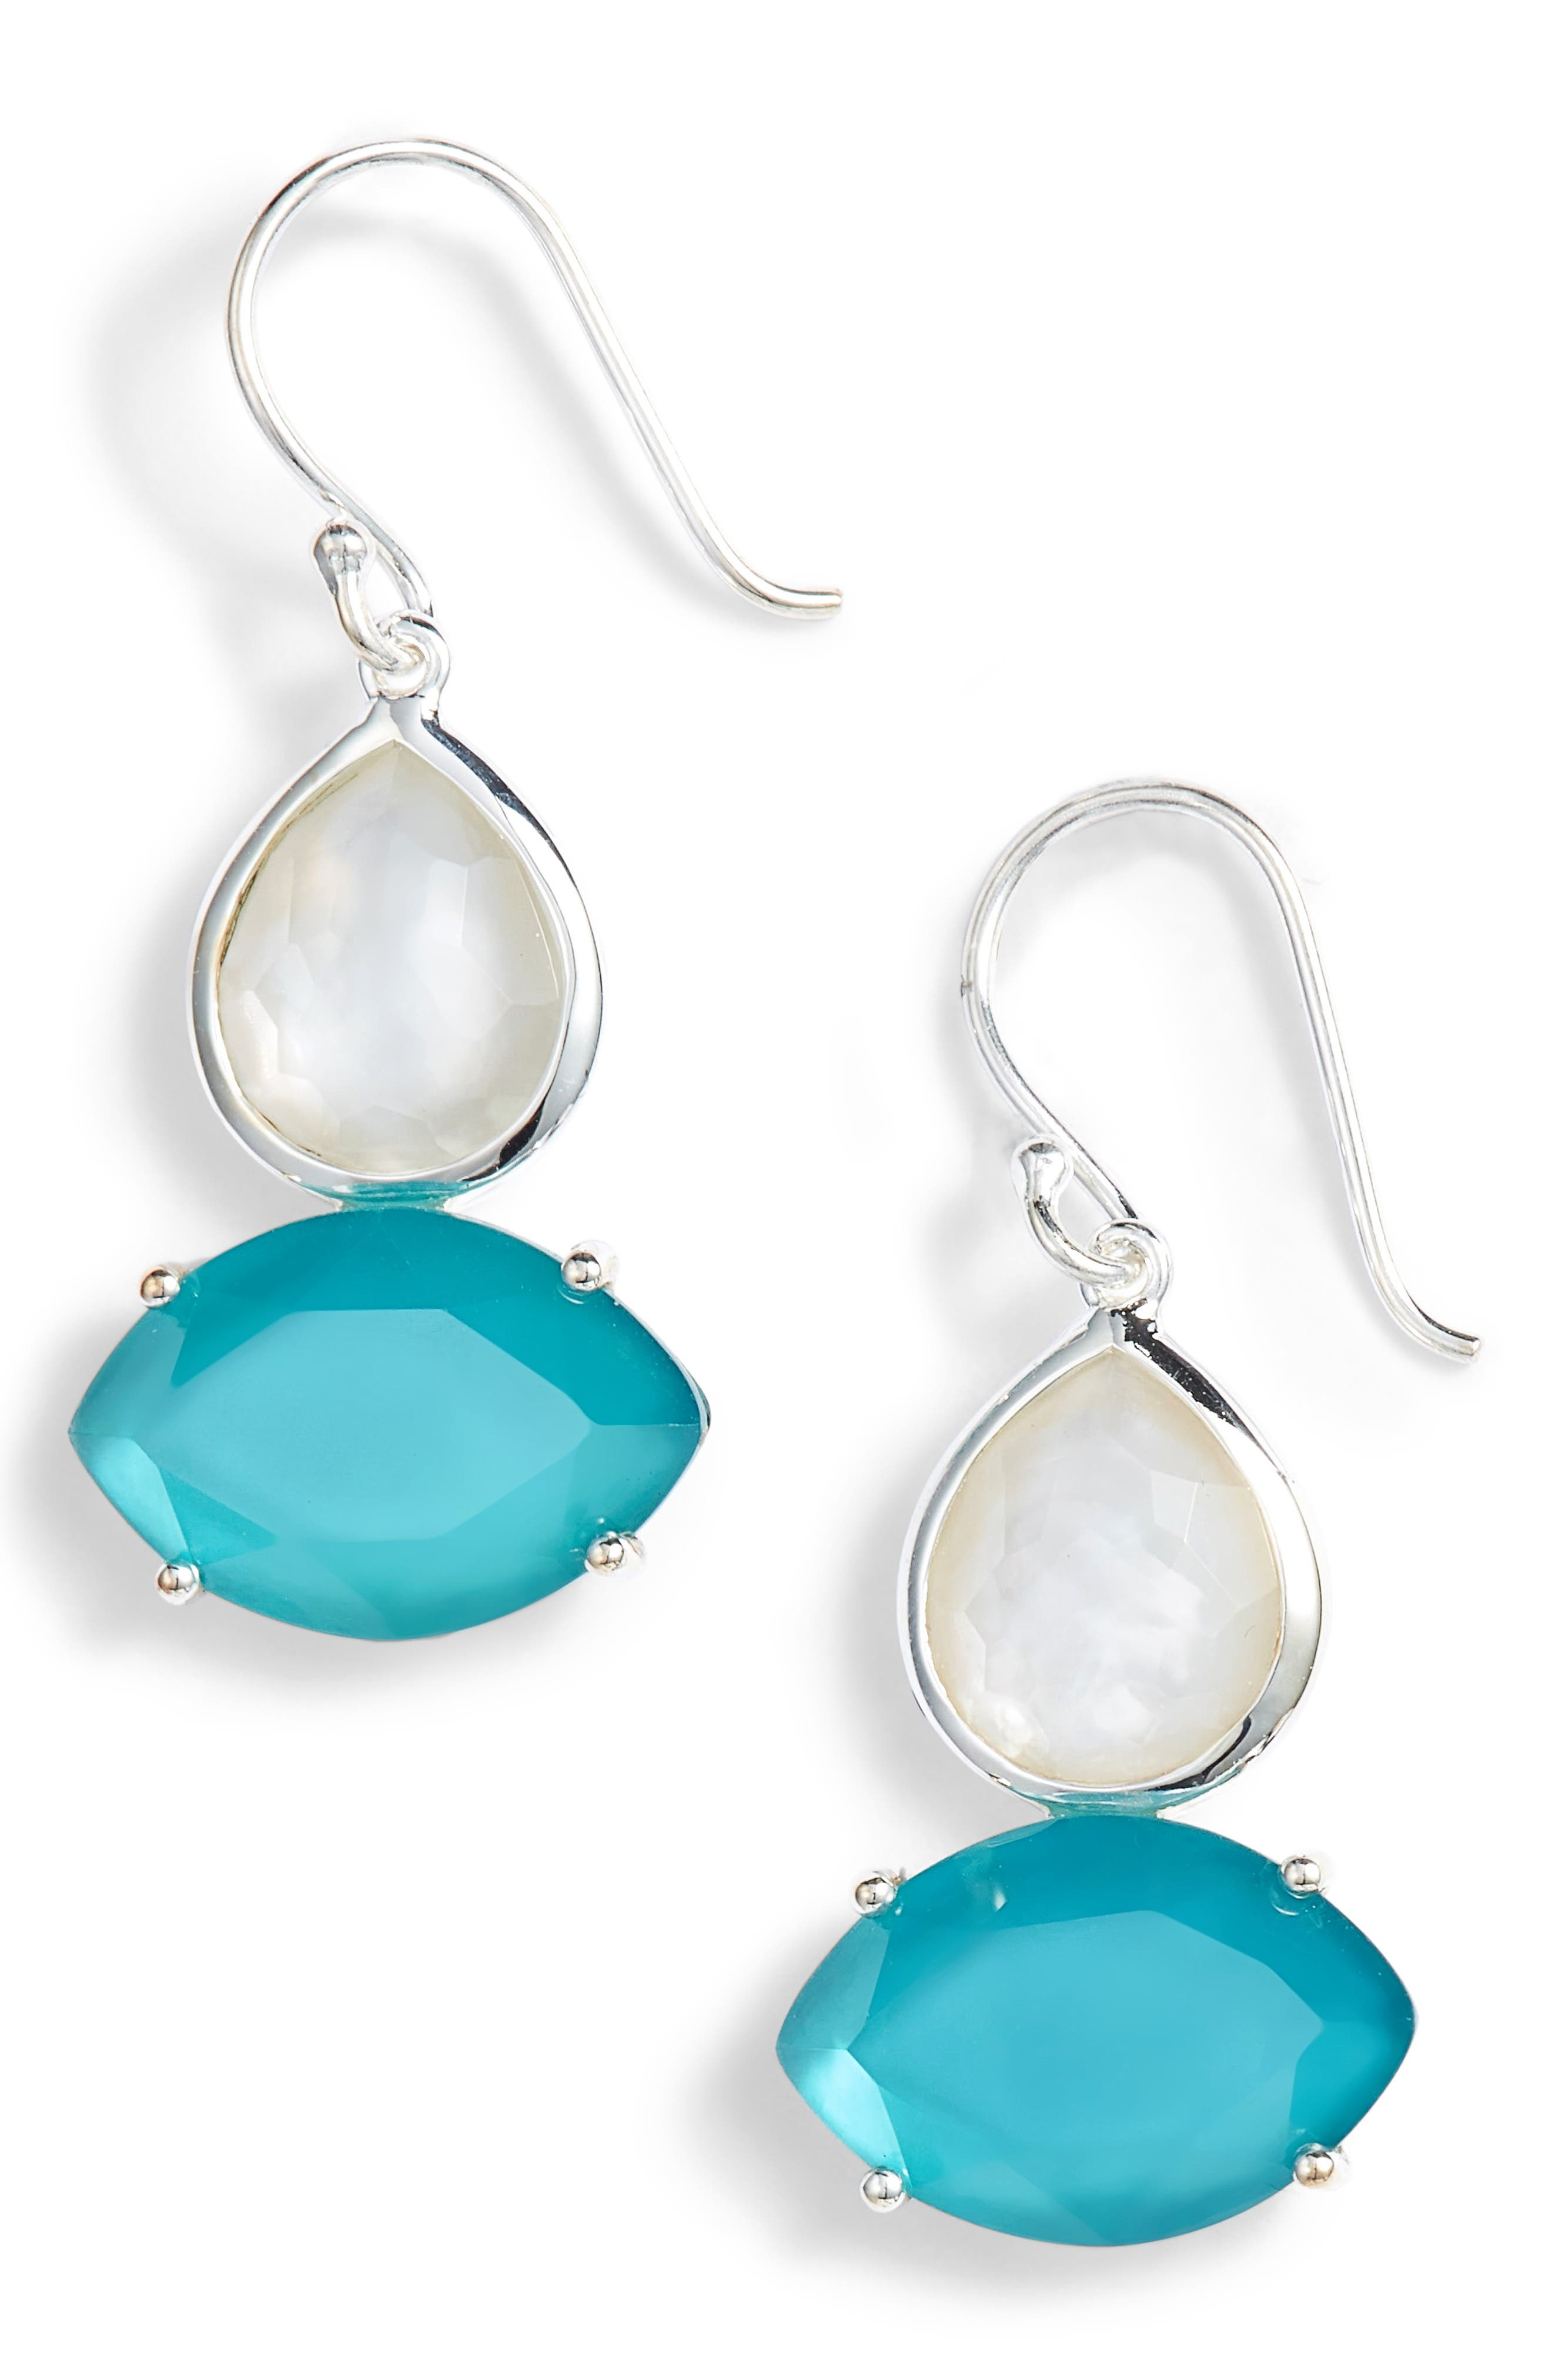 Wonderland 2-Stone Drop Earrings,                             Main thumbnail 1, color,                             BLUE/ MOP